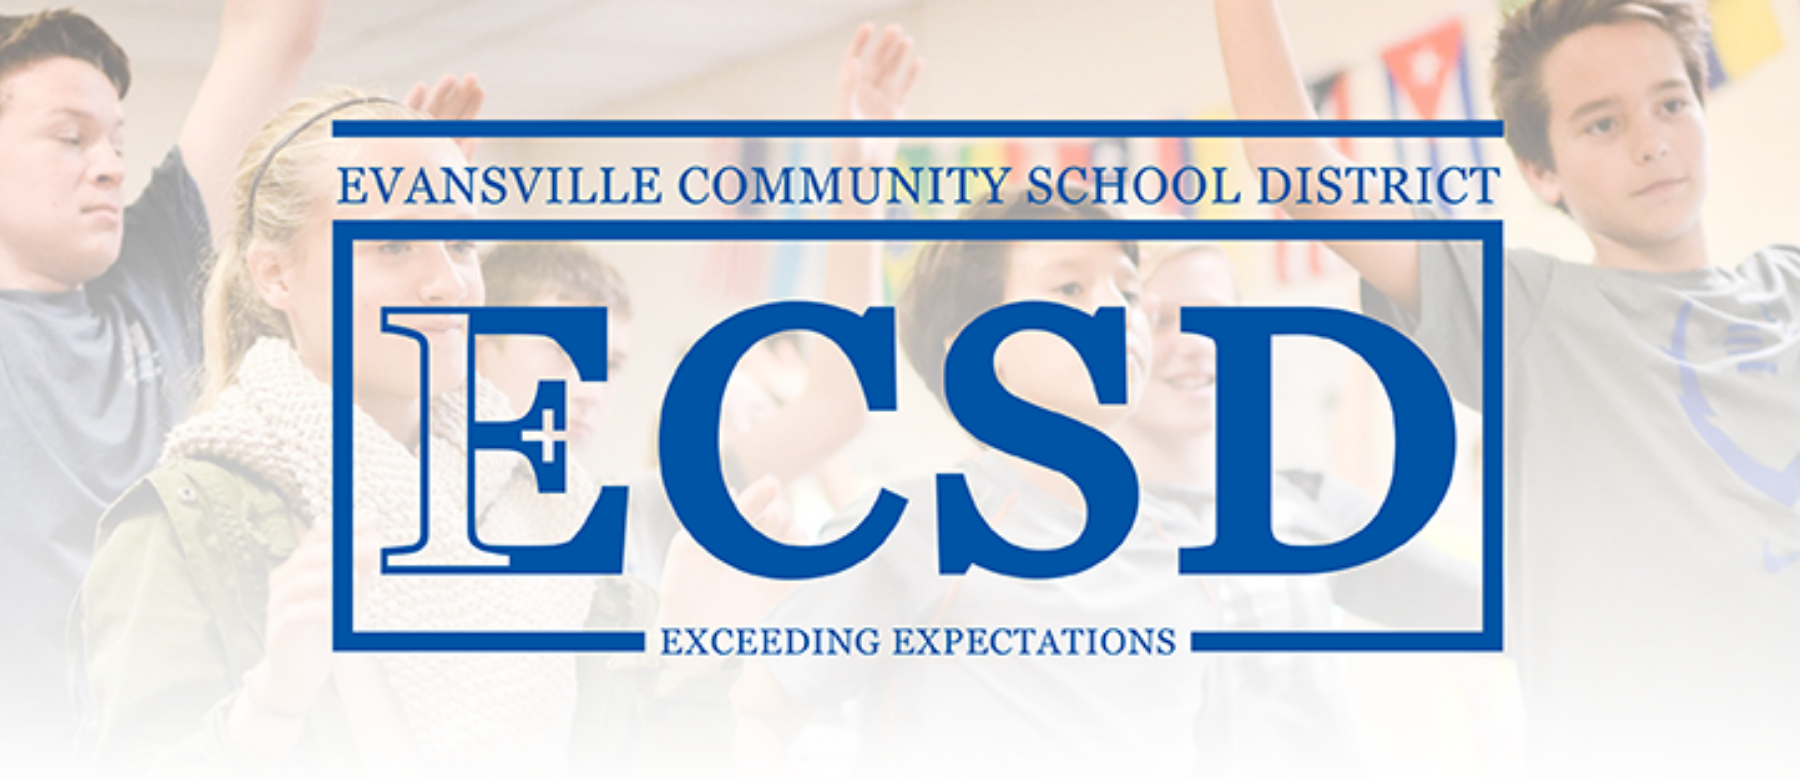 Evansville Community School District